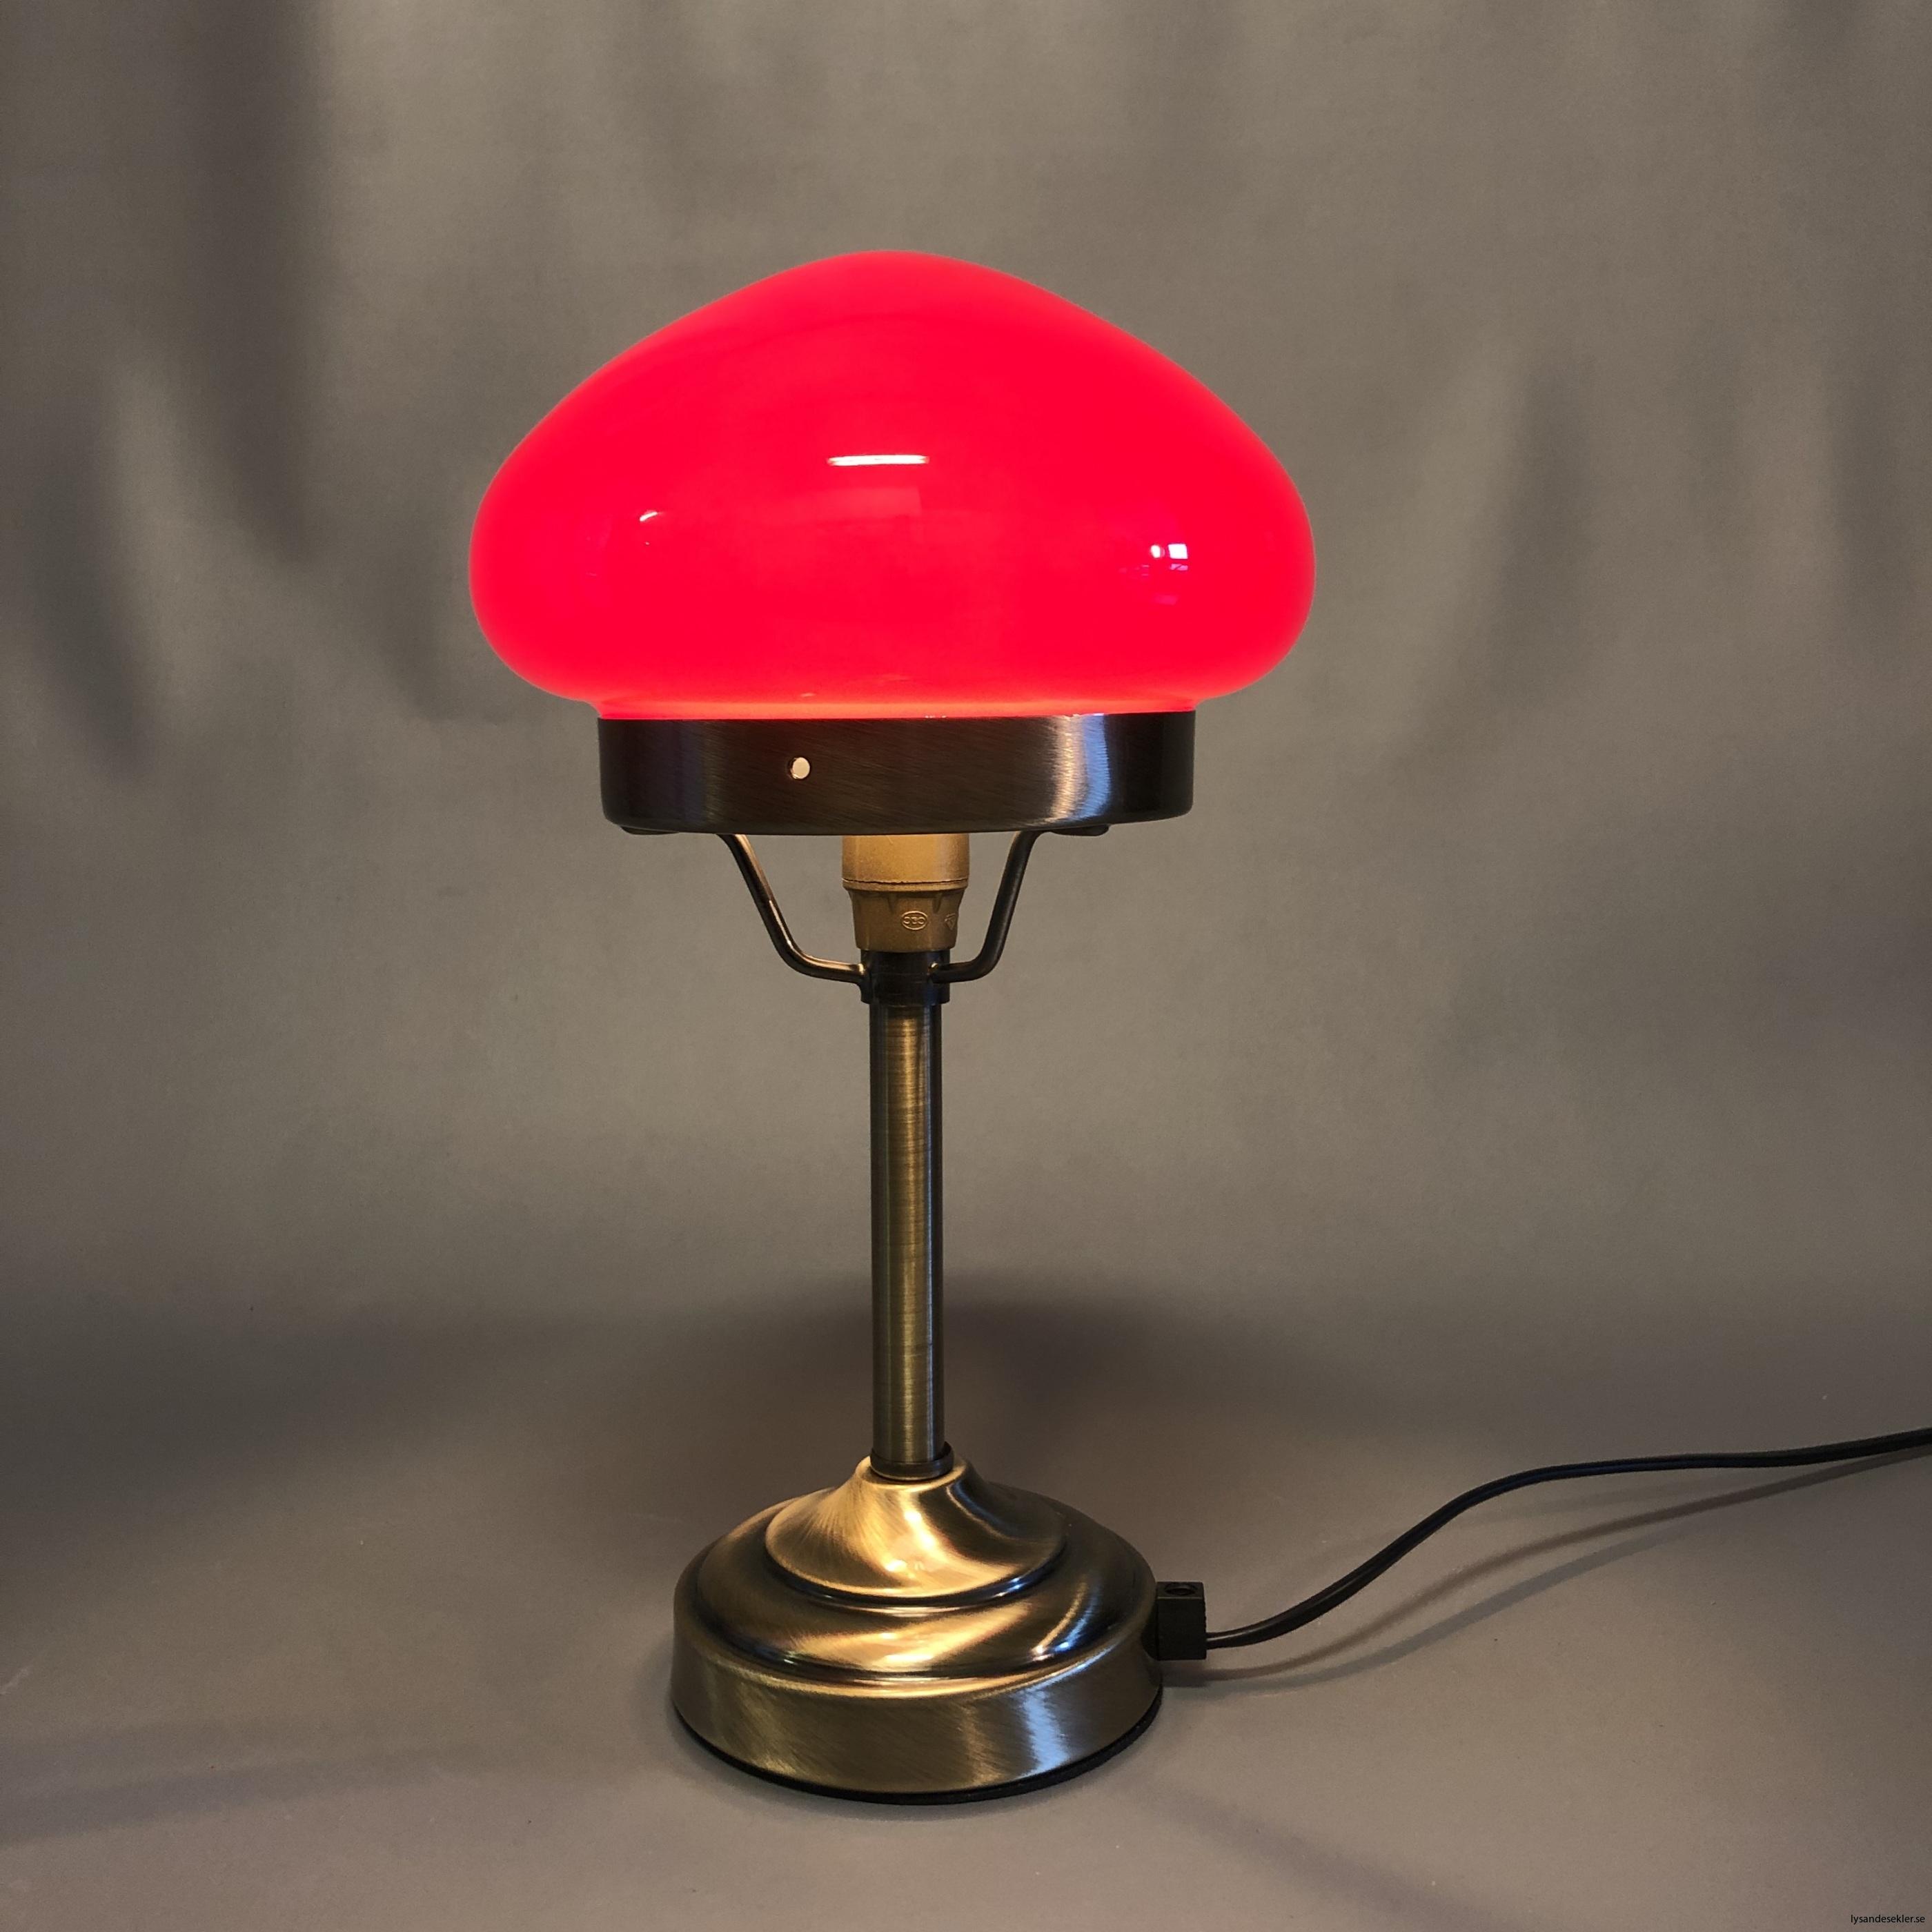 liten strindbergslampa 12 cm skärm13